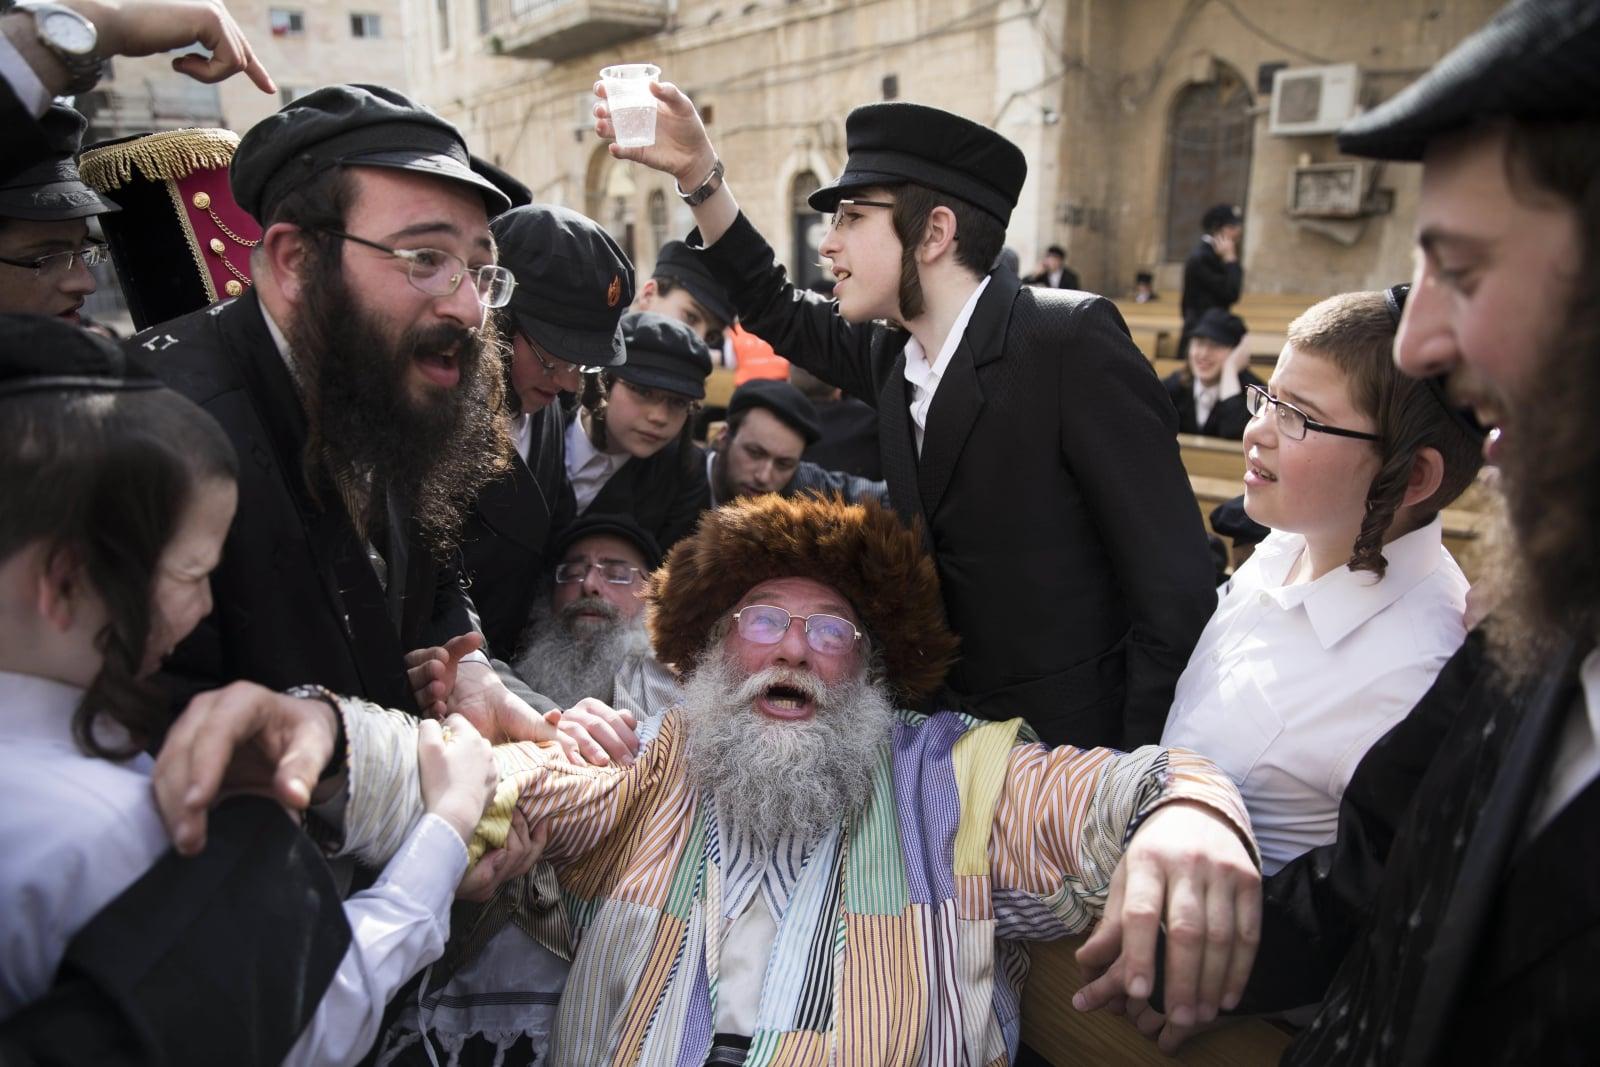 Izrael - święto Purim   EPA/ABIR SULTAN